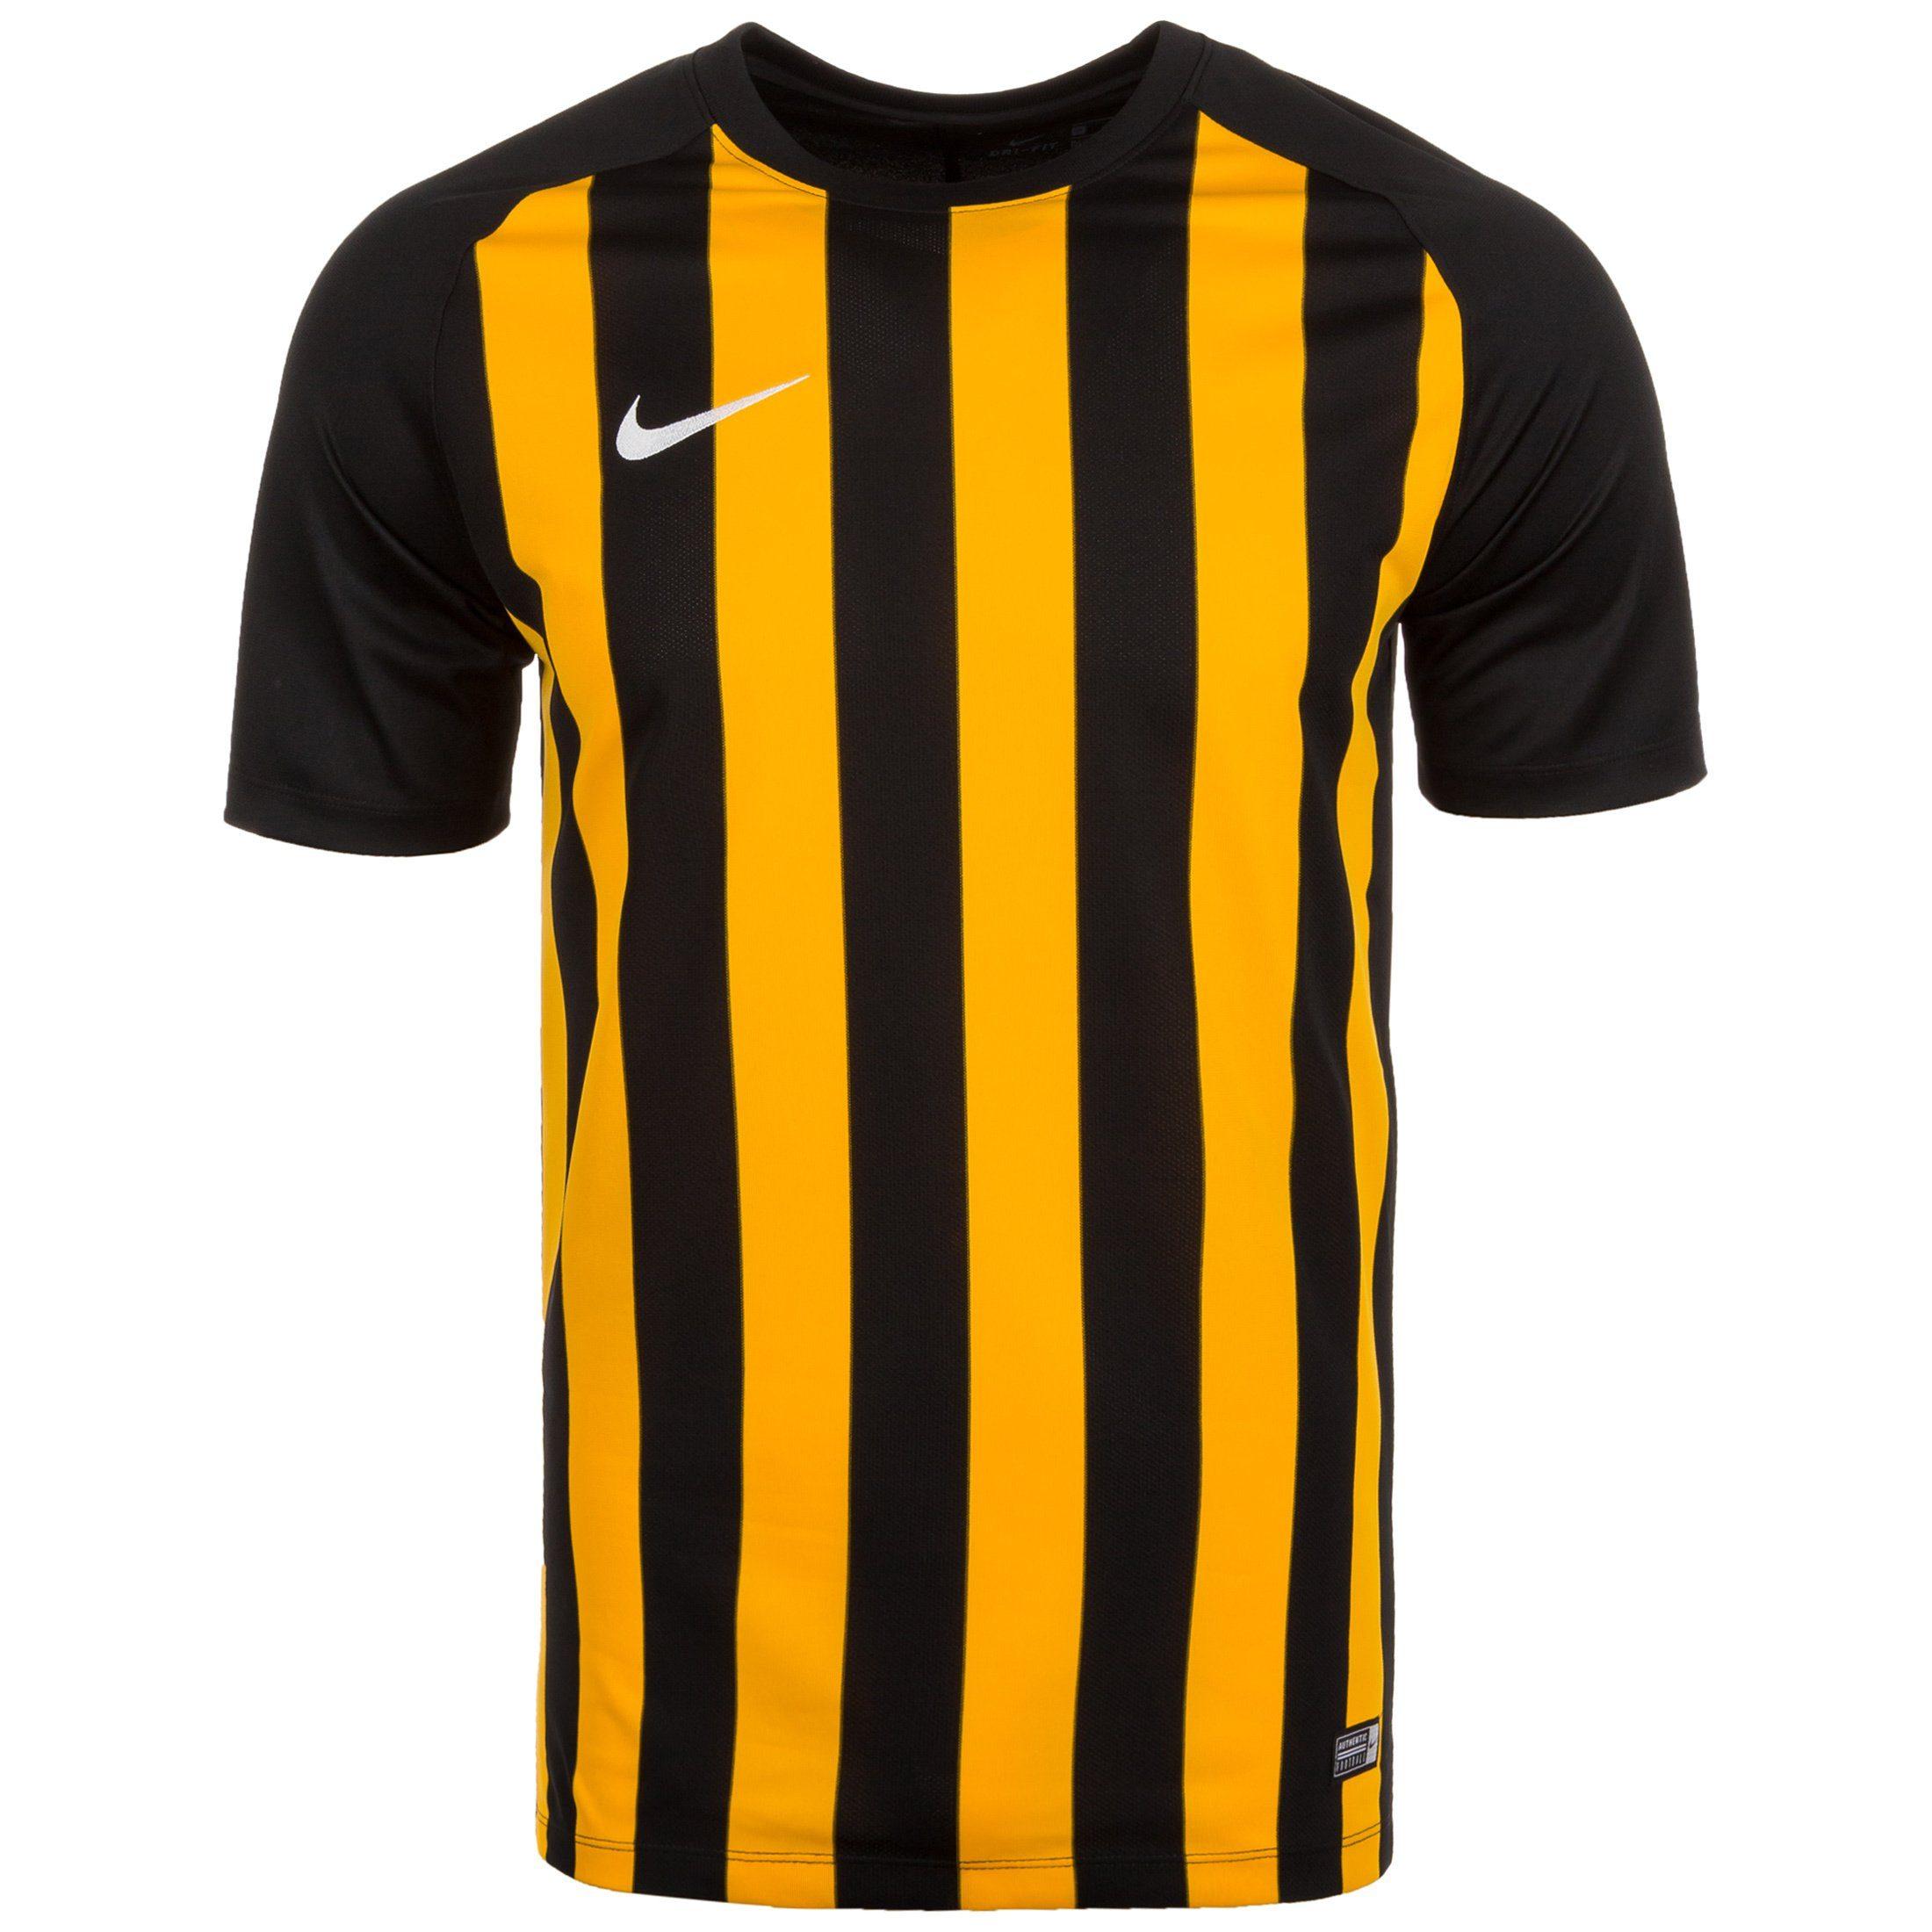 Nike Fußballtrikot Dry Striped Segment Iii   Sportbekleidung > Trikots > Fußballtrikots   Nike